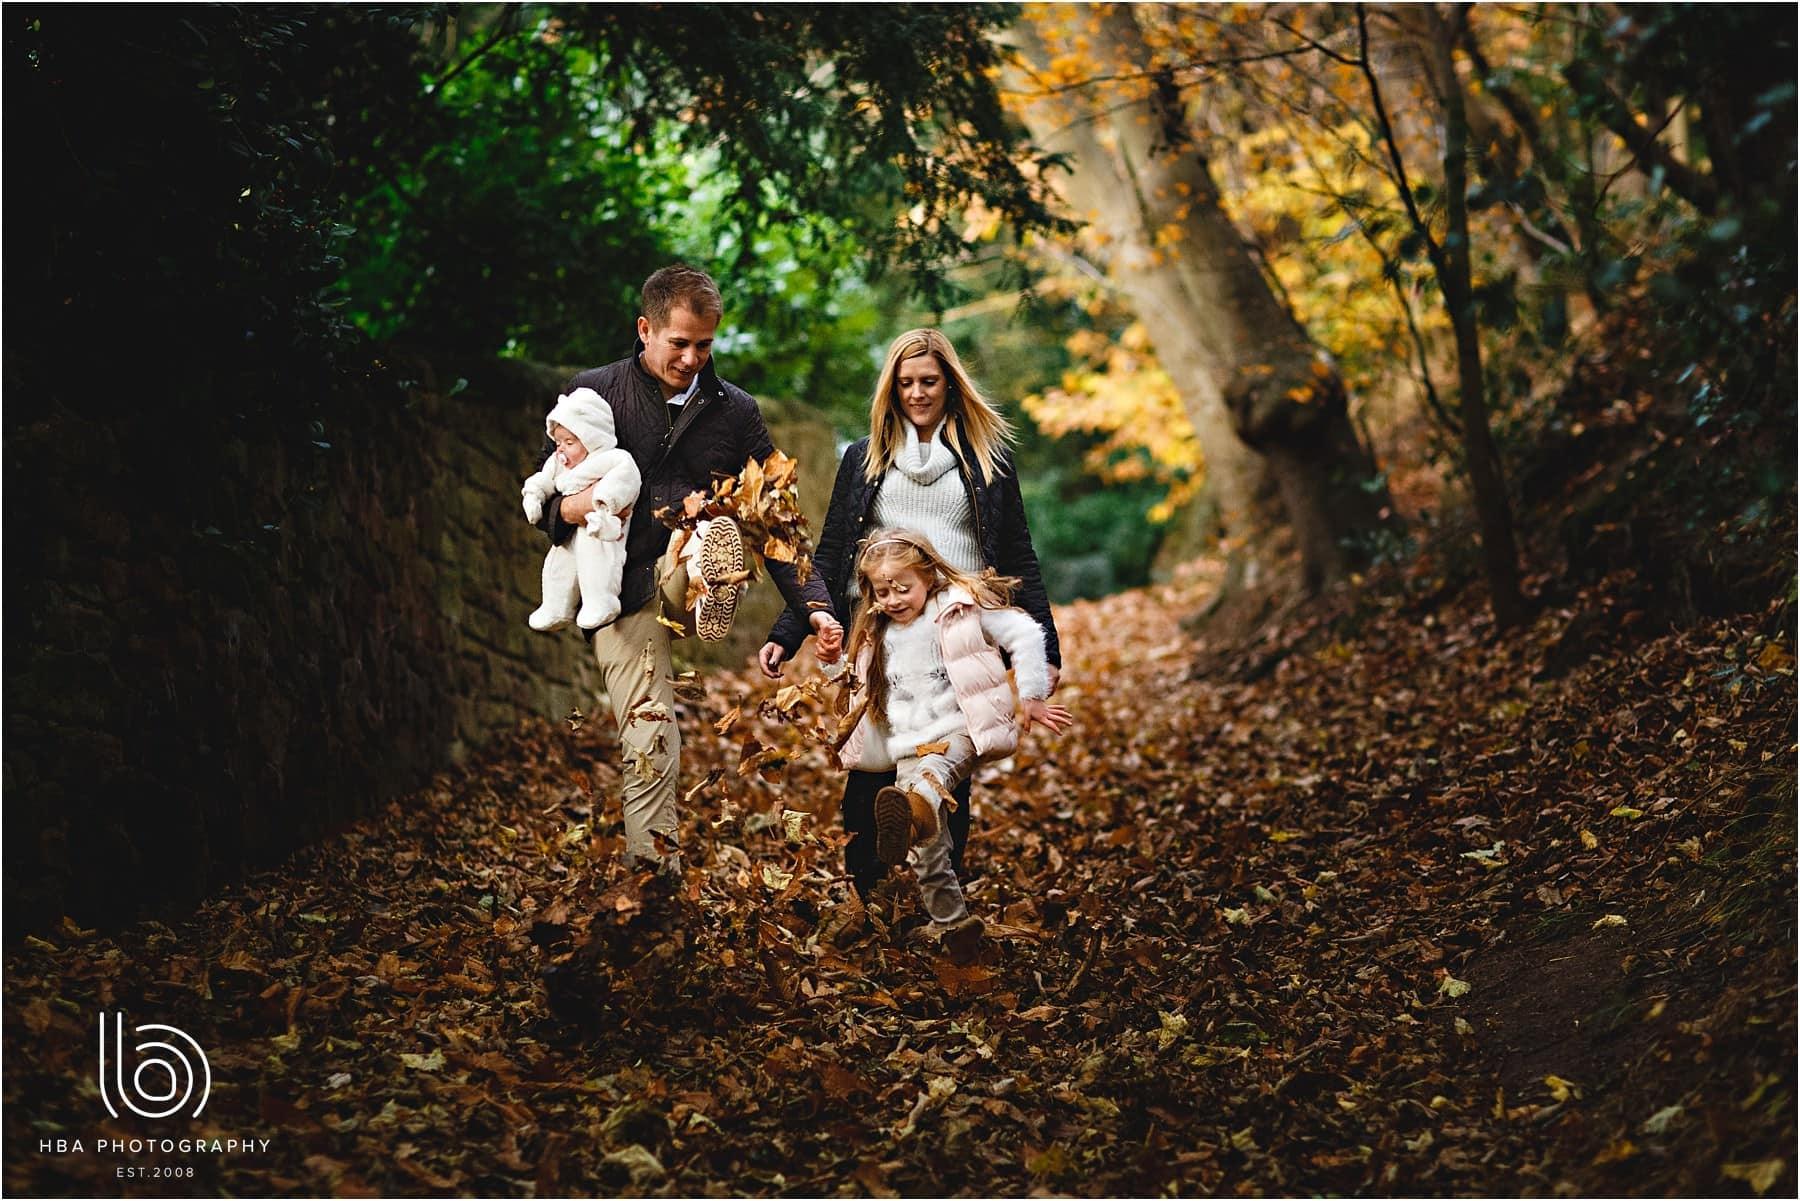 the-bainbridge-family-photos-in-derbyshire_0019